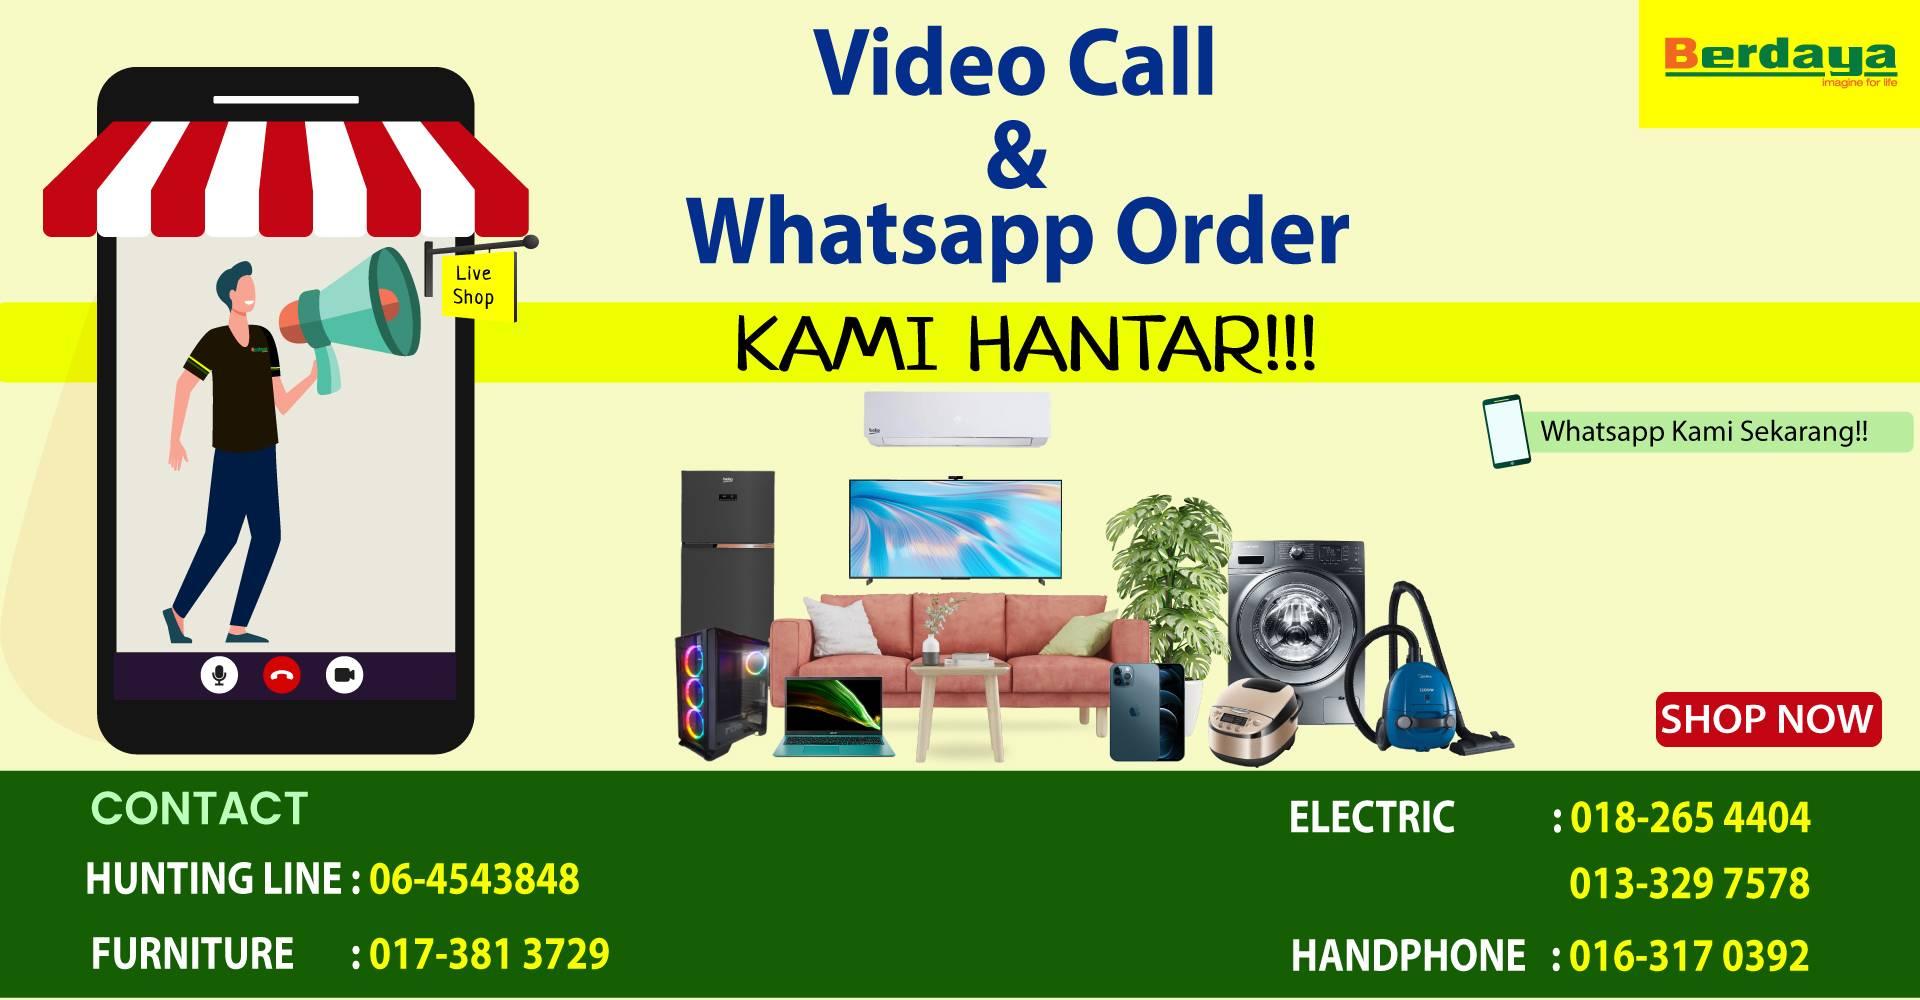 Video Call & WhatsApp Order